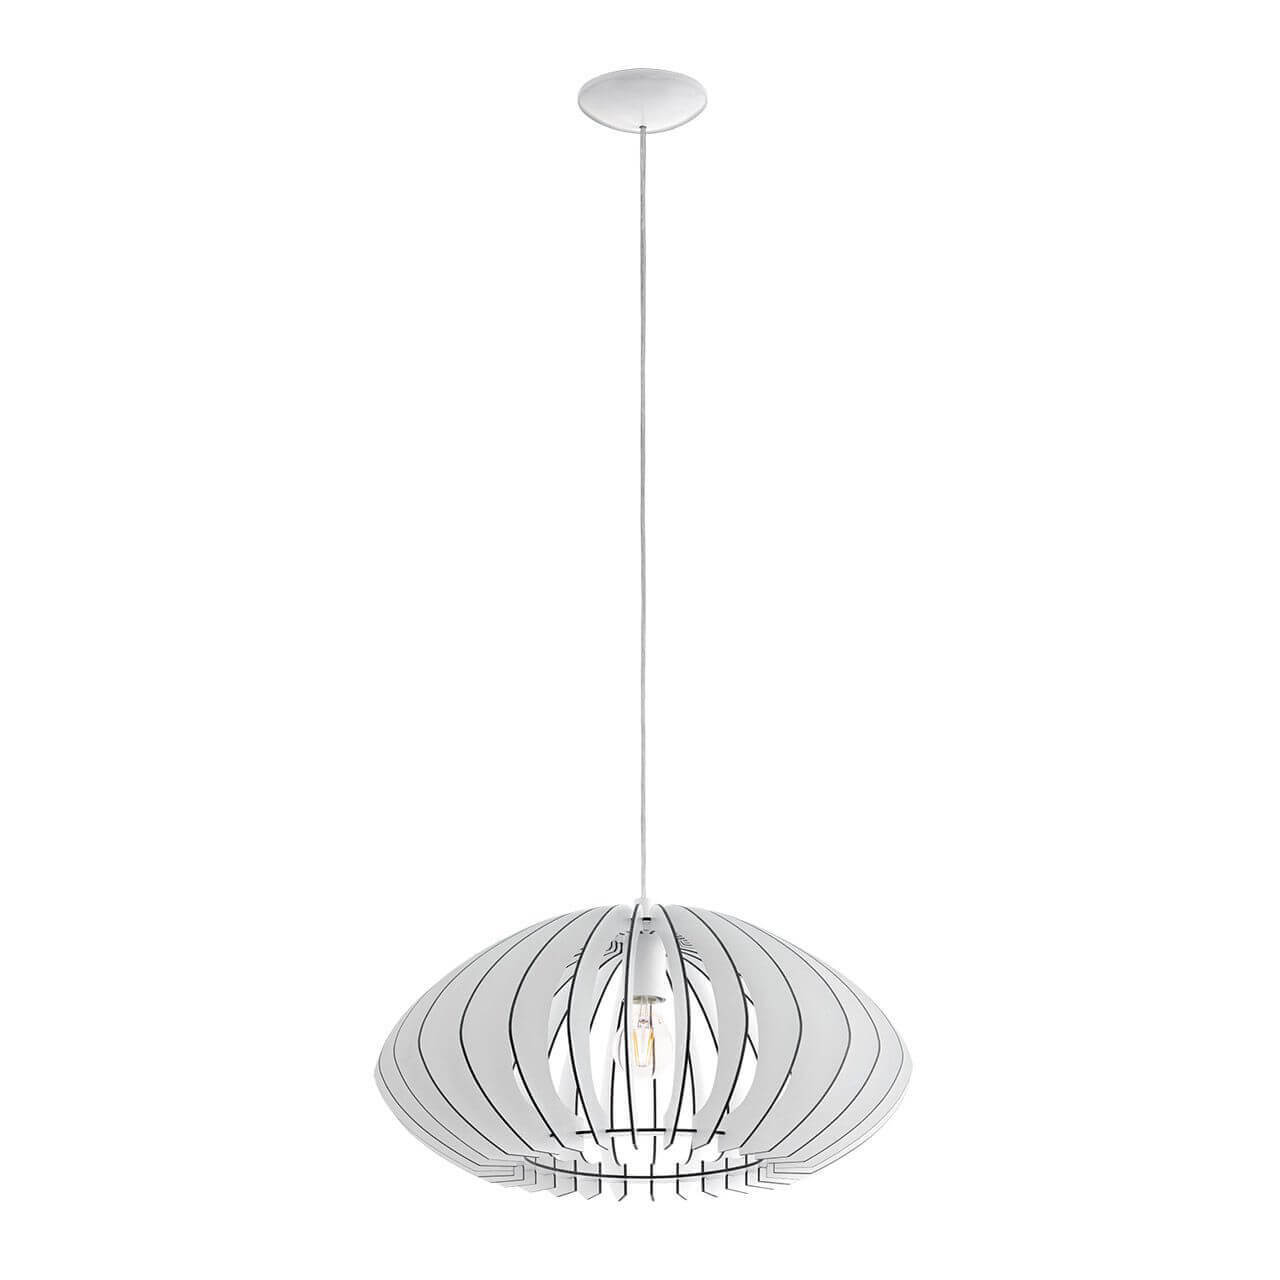 Светильник Eglo 95254 Cossano настольная лампа eglo 94956 cossano